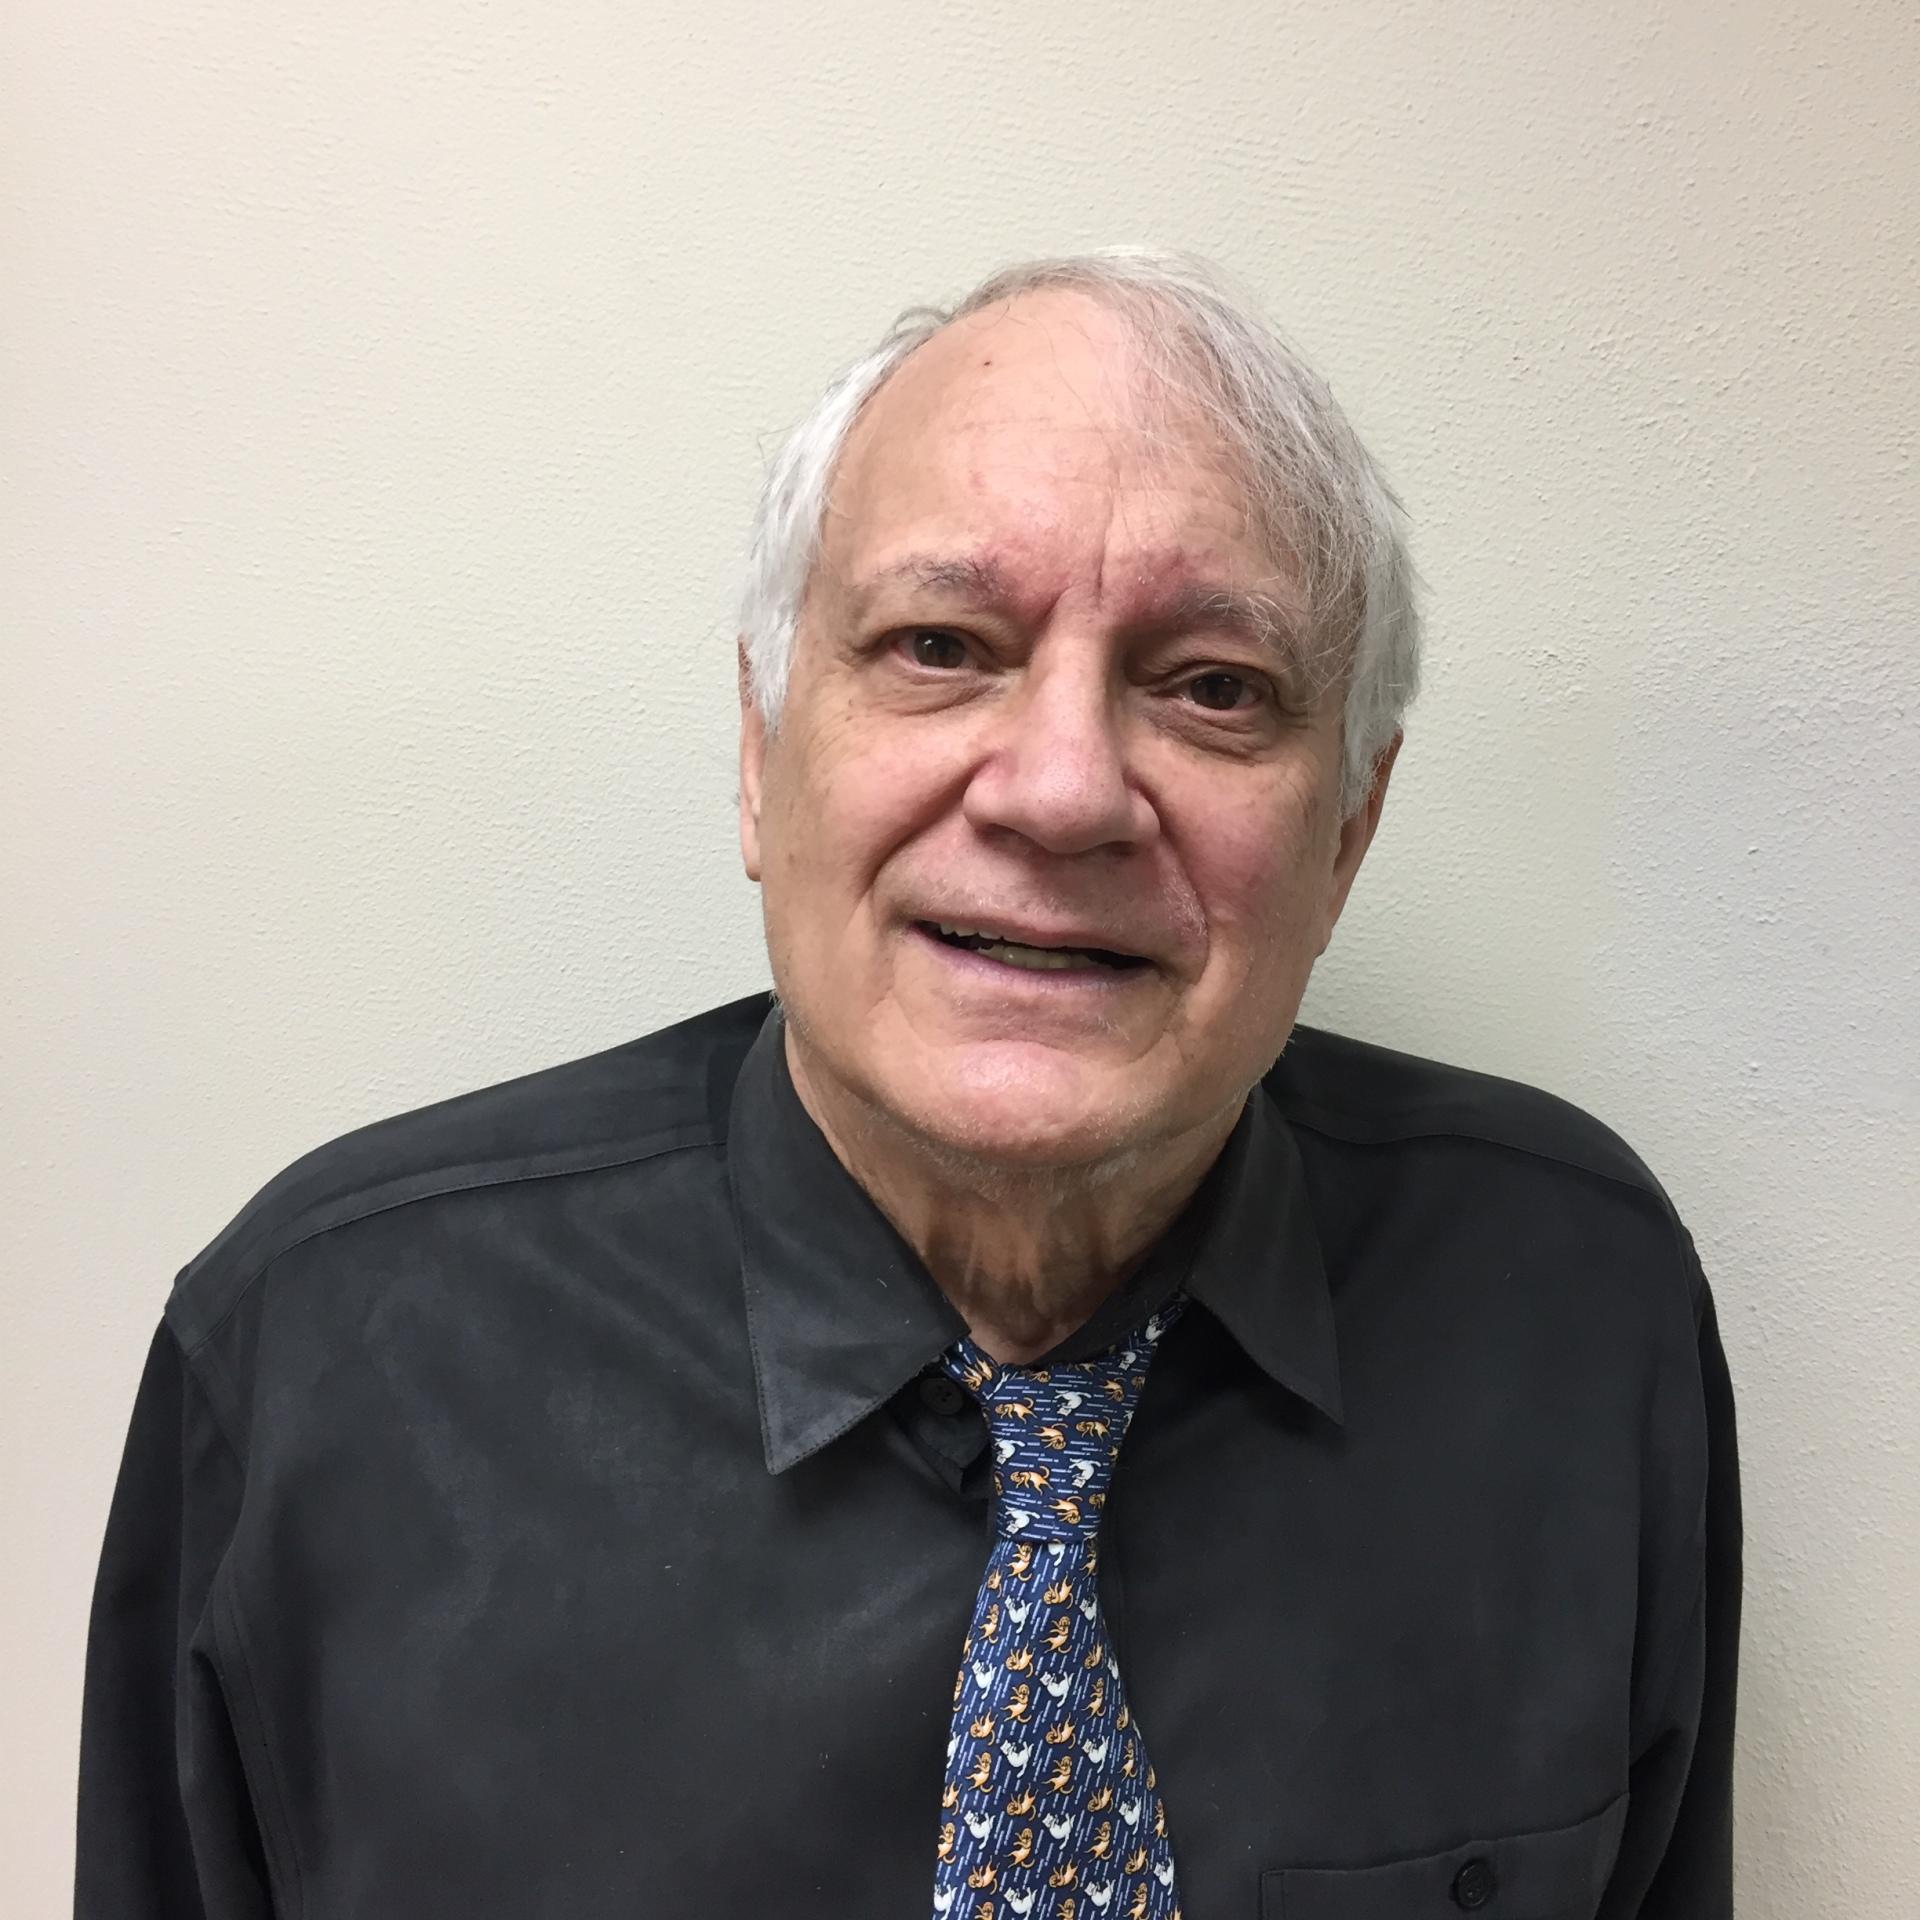 Dr. Jay Blumenthal